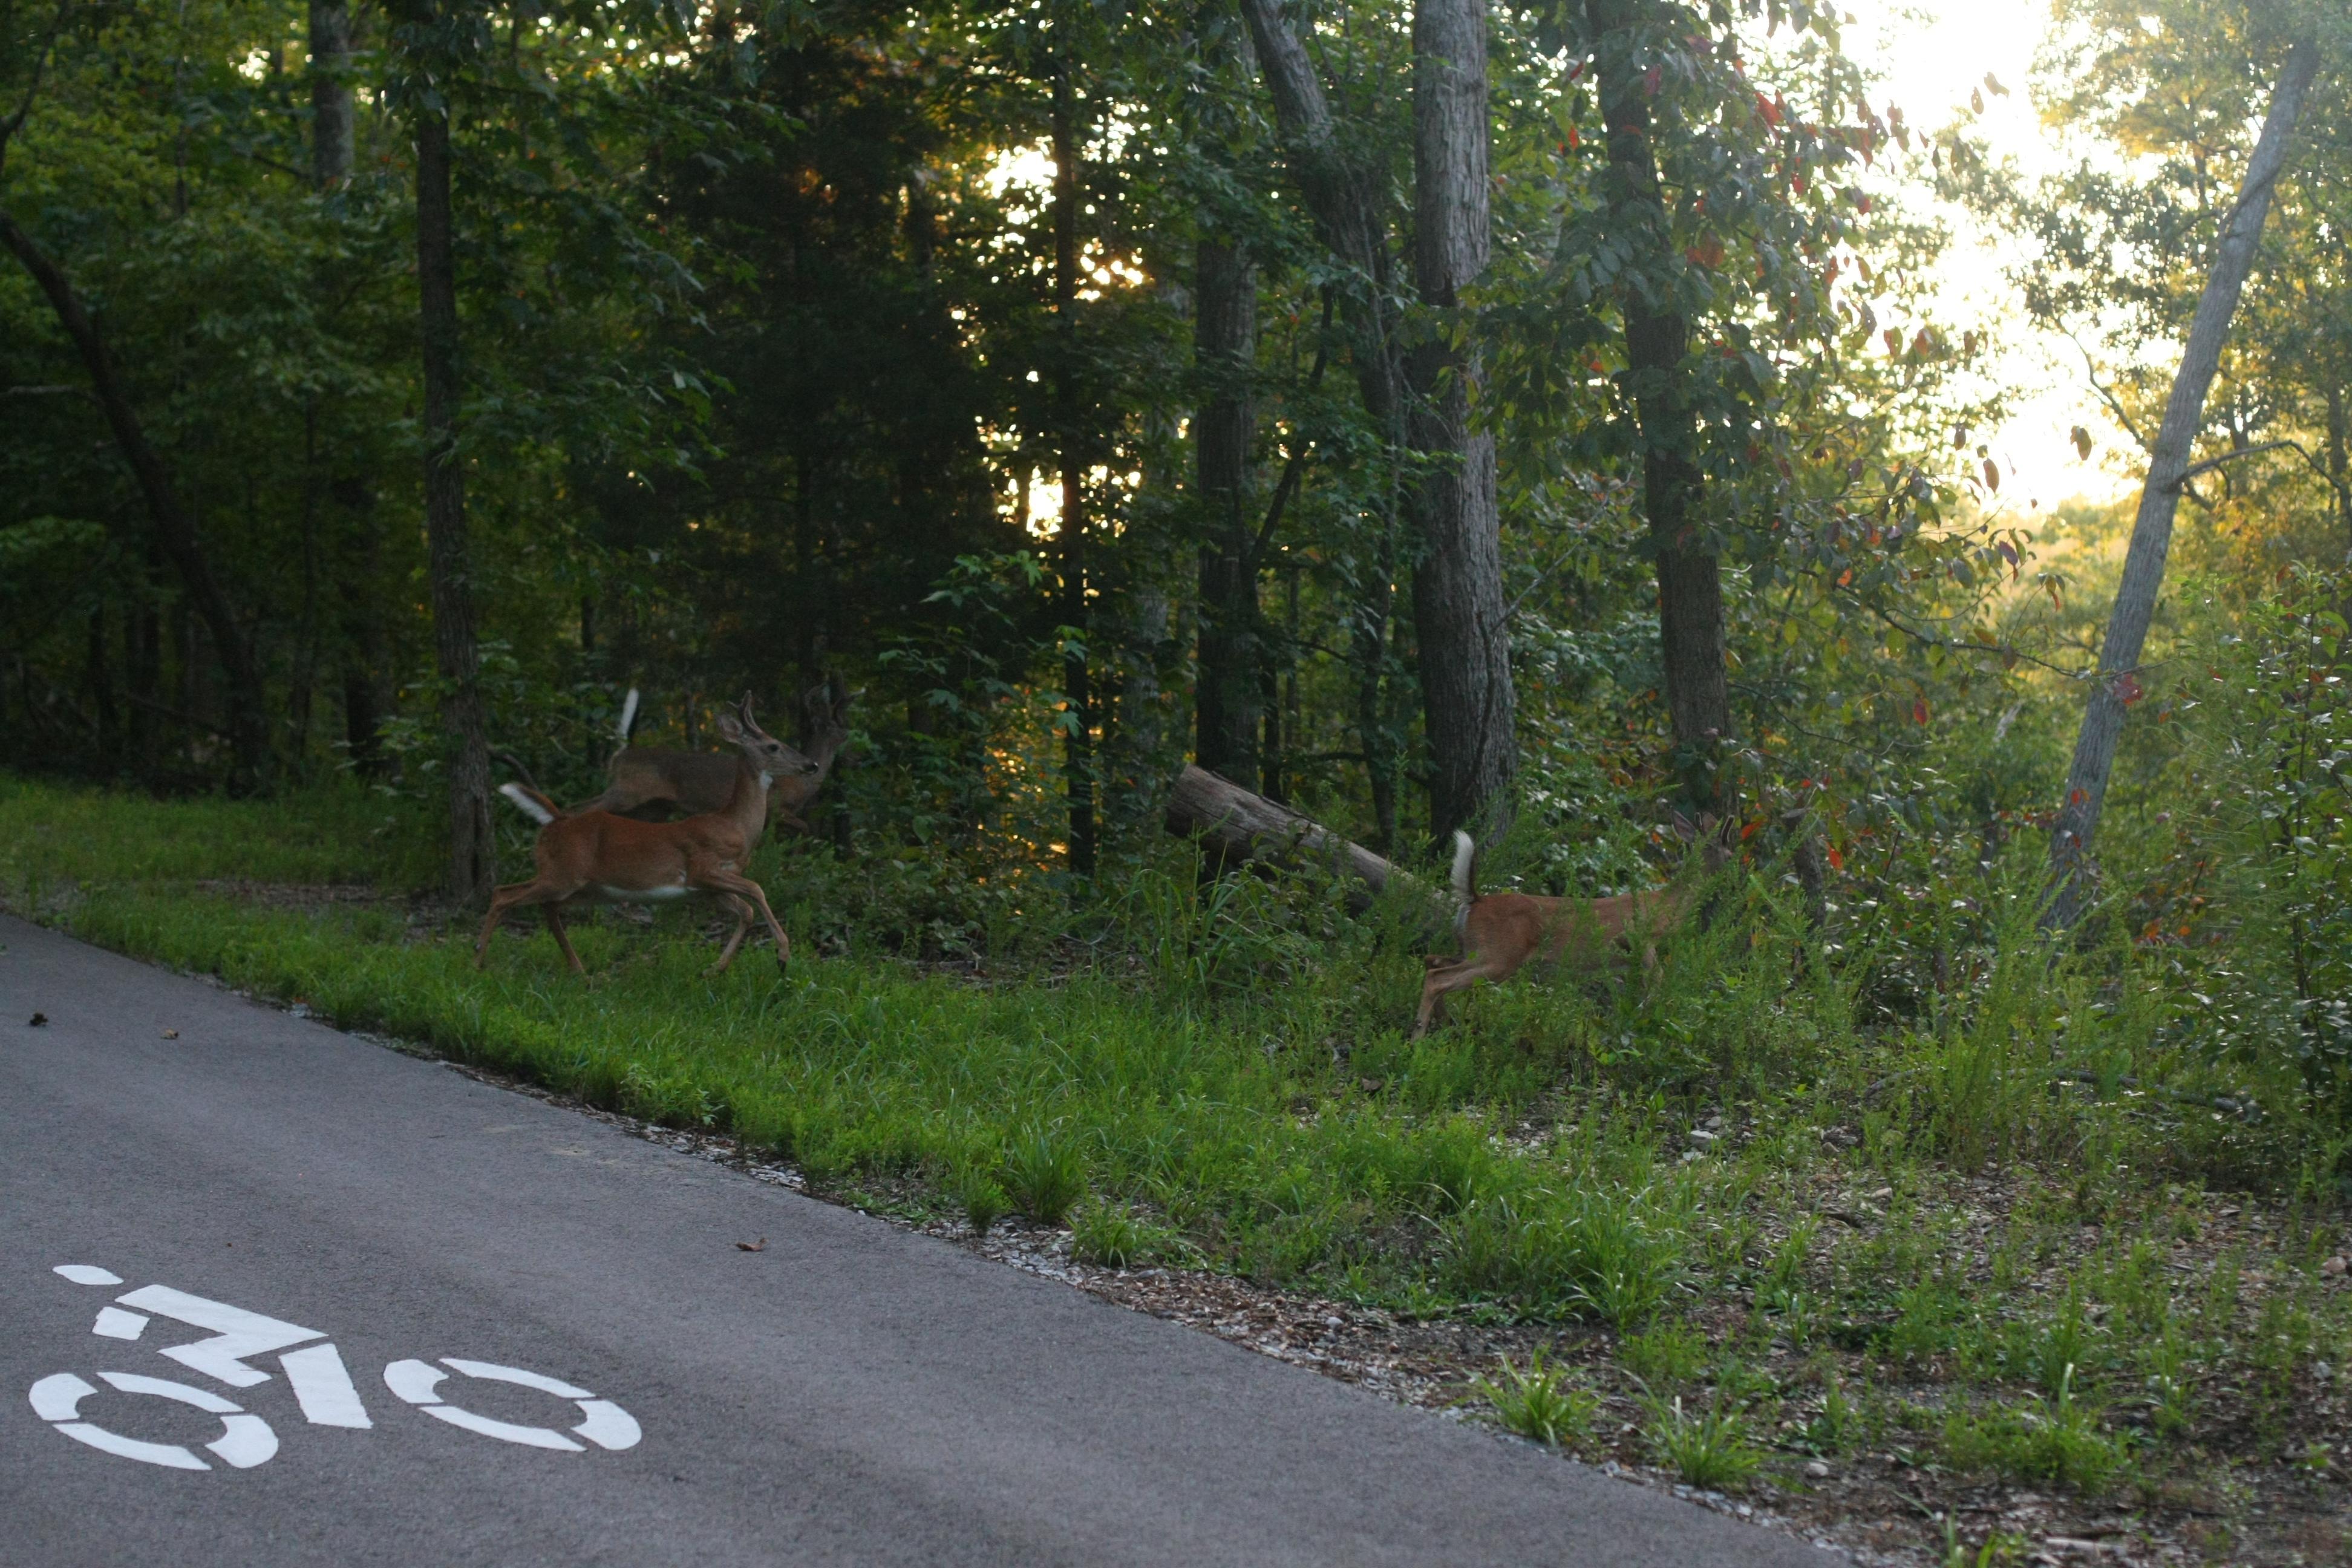 Still Hollow Half Marathon & 10K - Wild Trails Race Series - Chattanooga, TN - Enterprise South